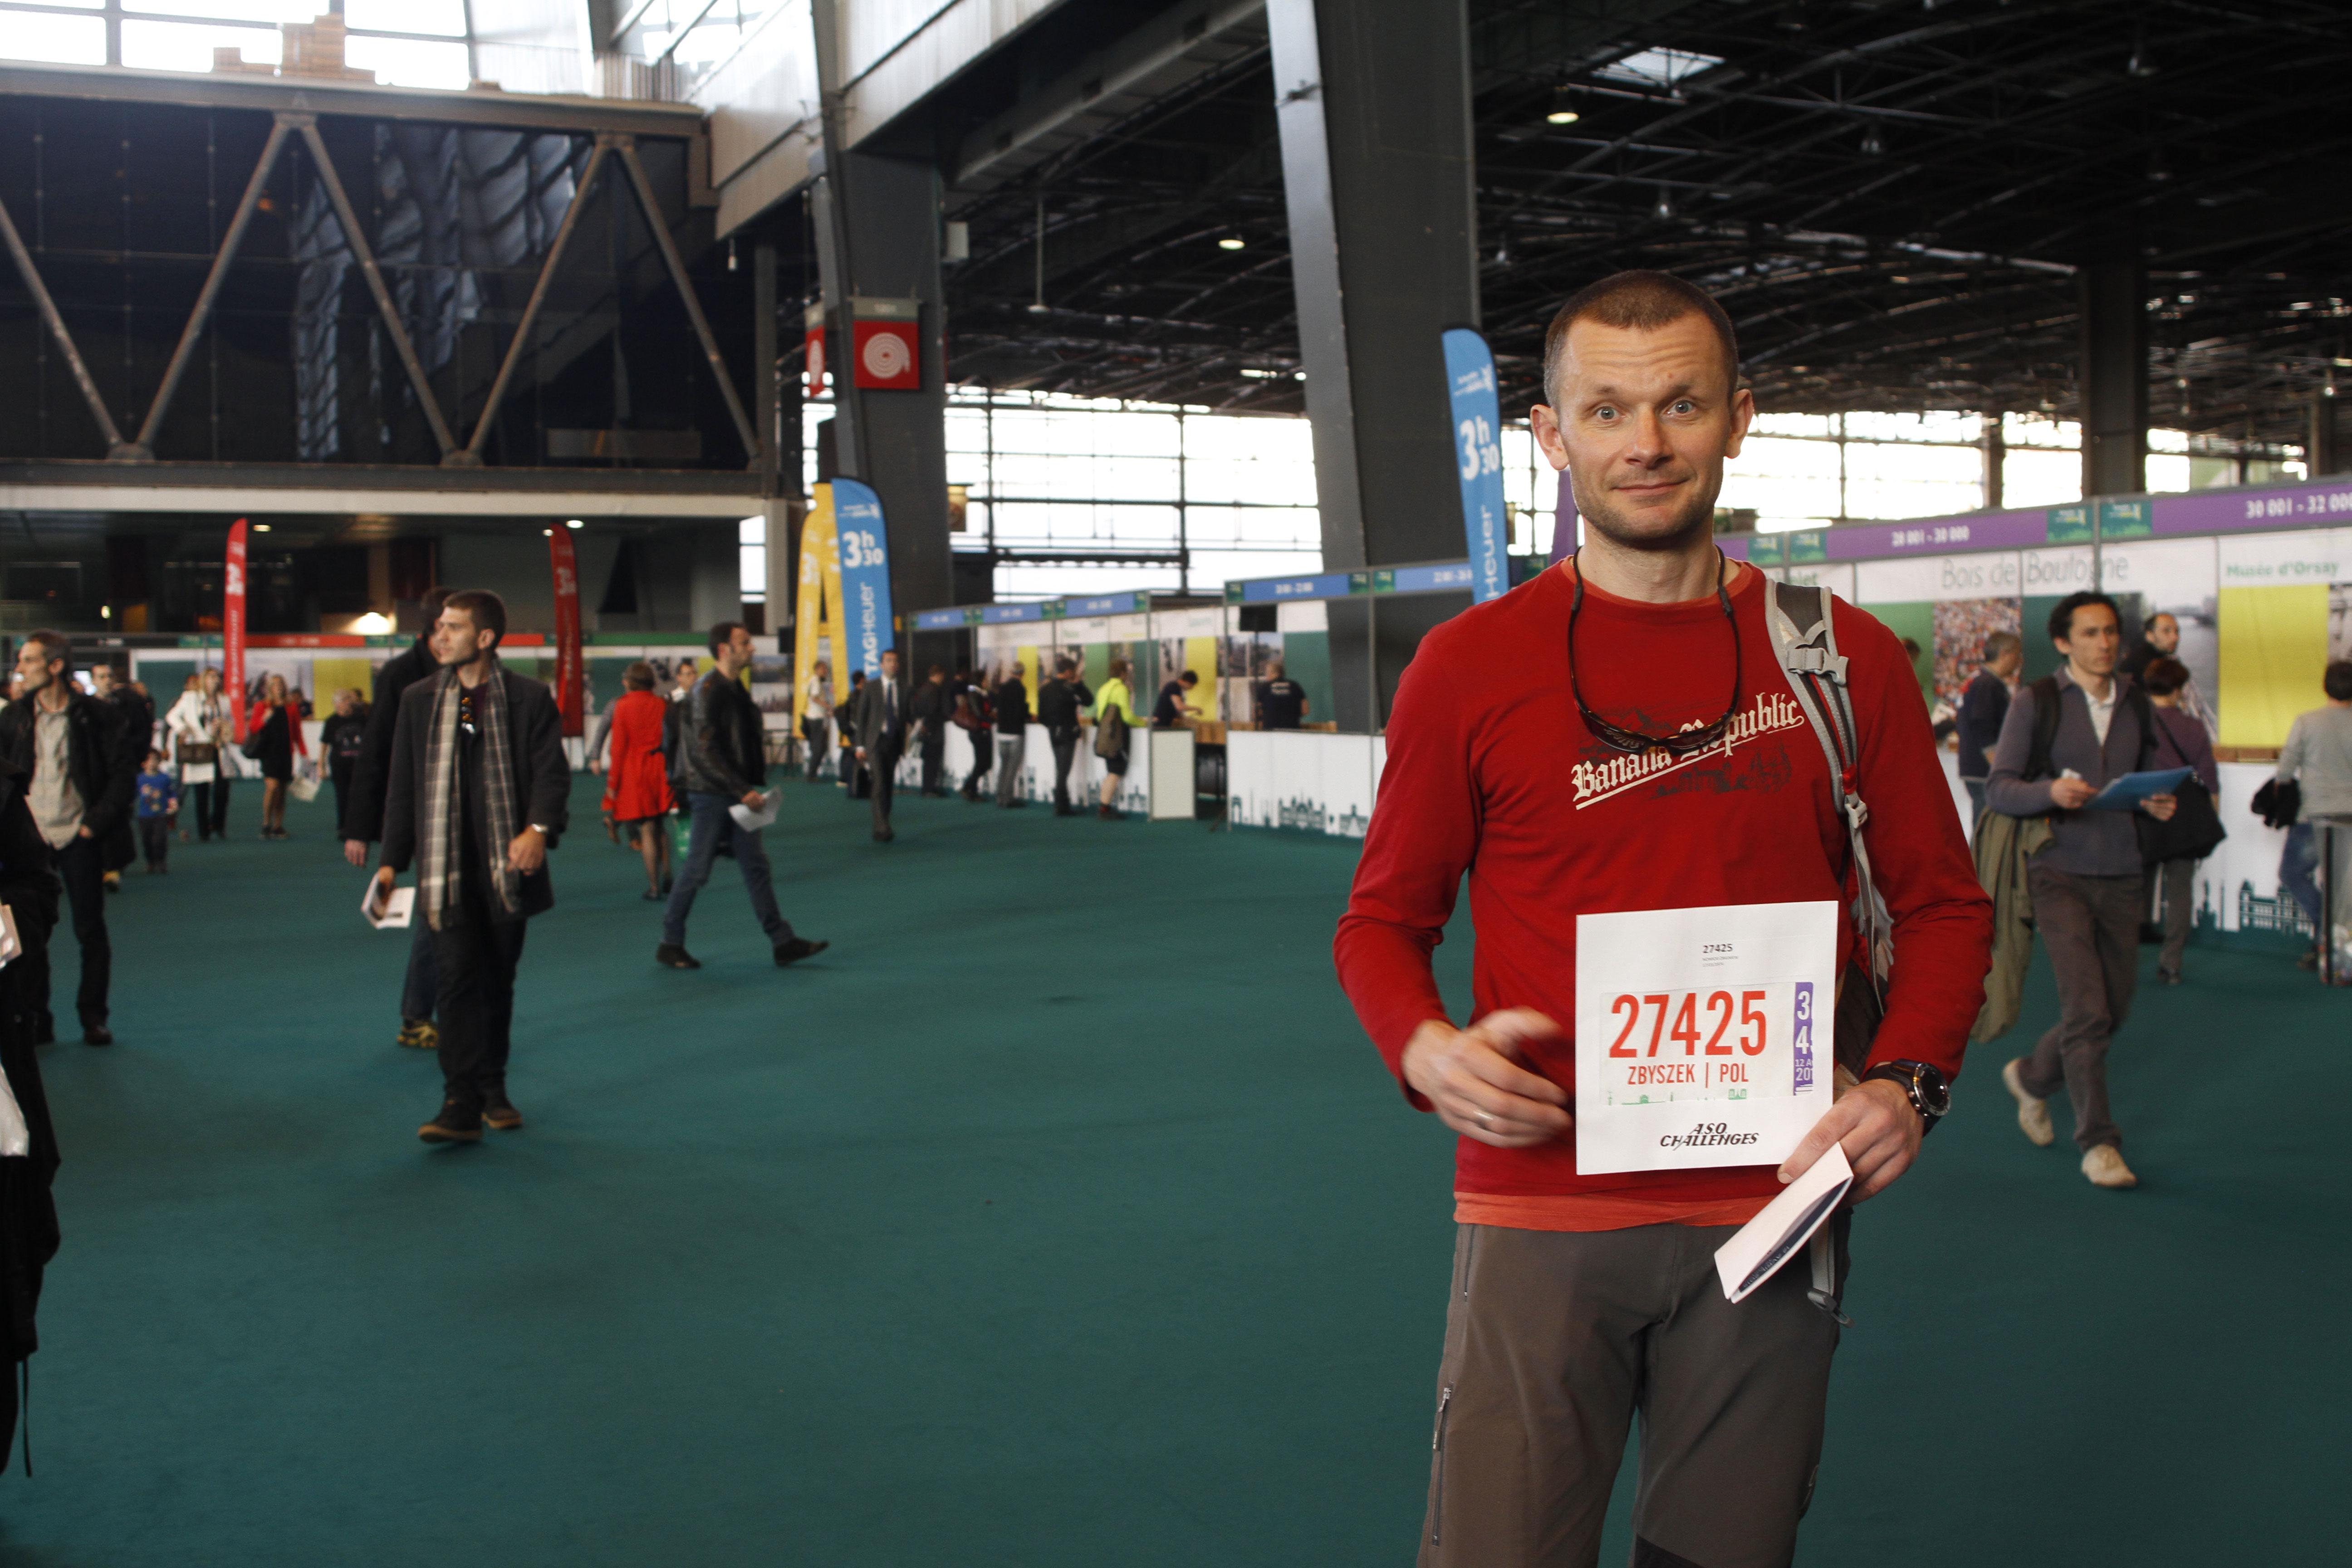 Zbyszek, au Salon du Running du Marathon de Paris 2015. Ph. Moctar KANE.